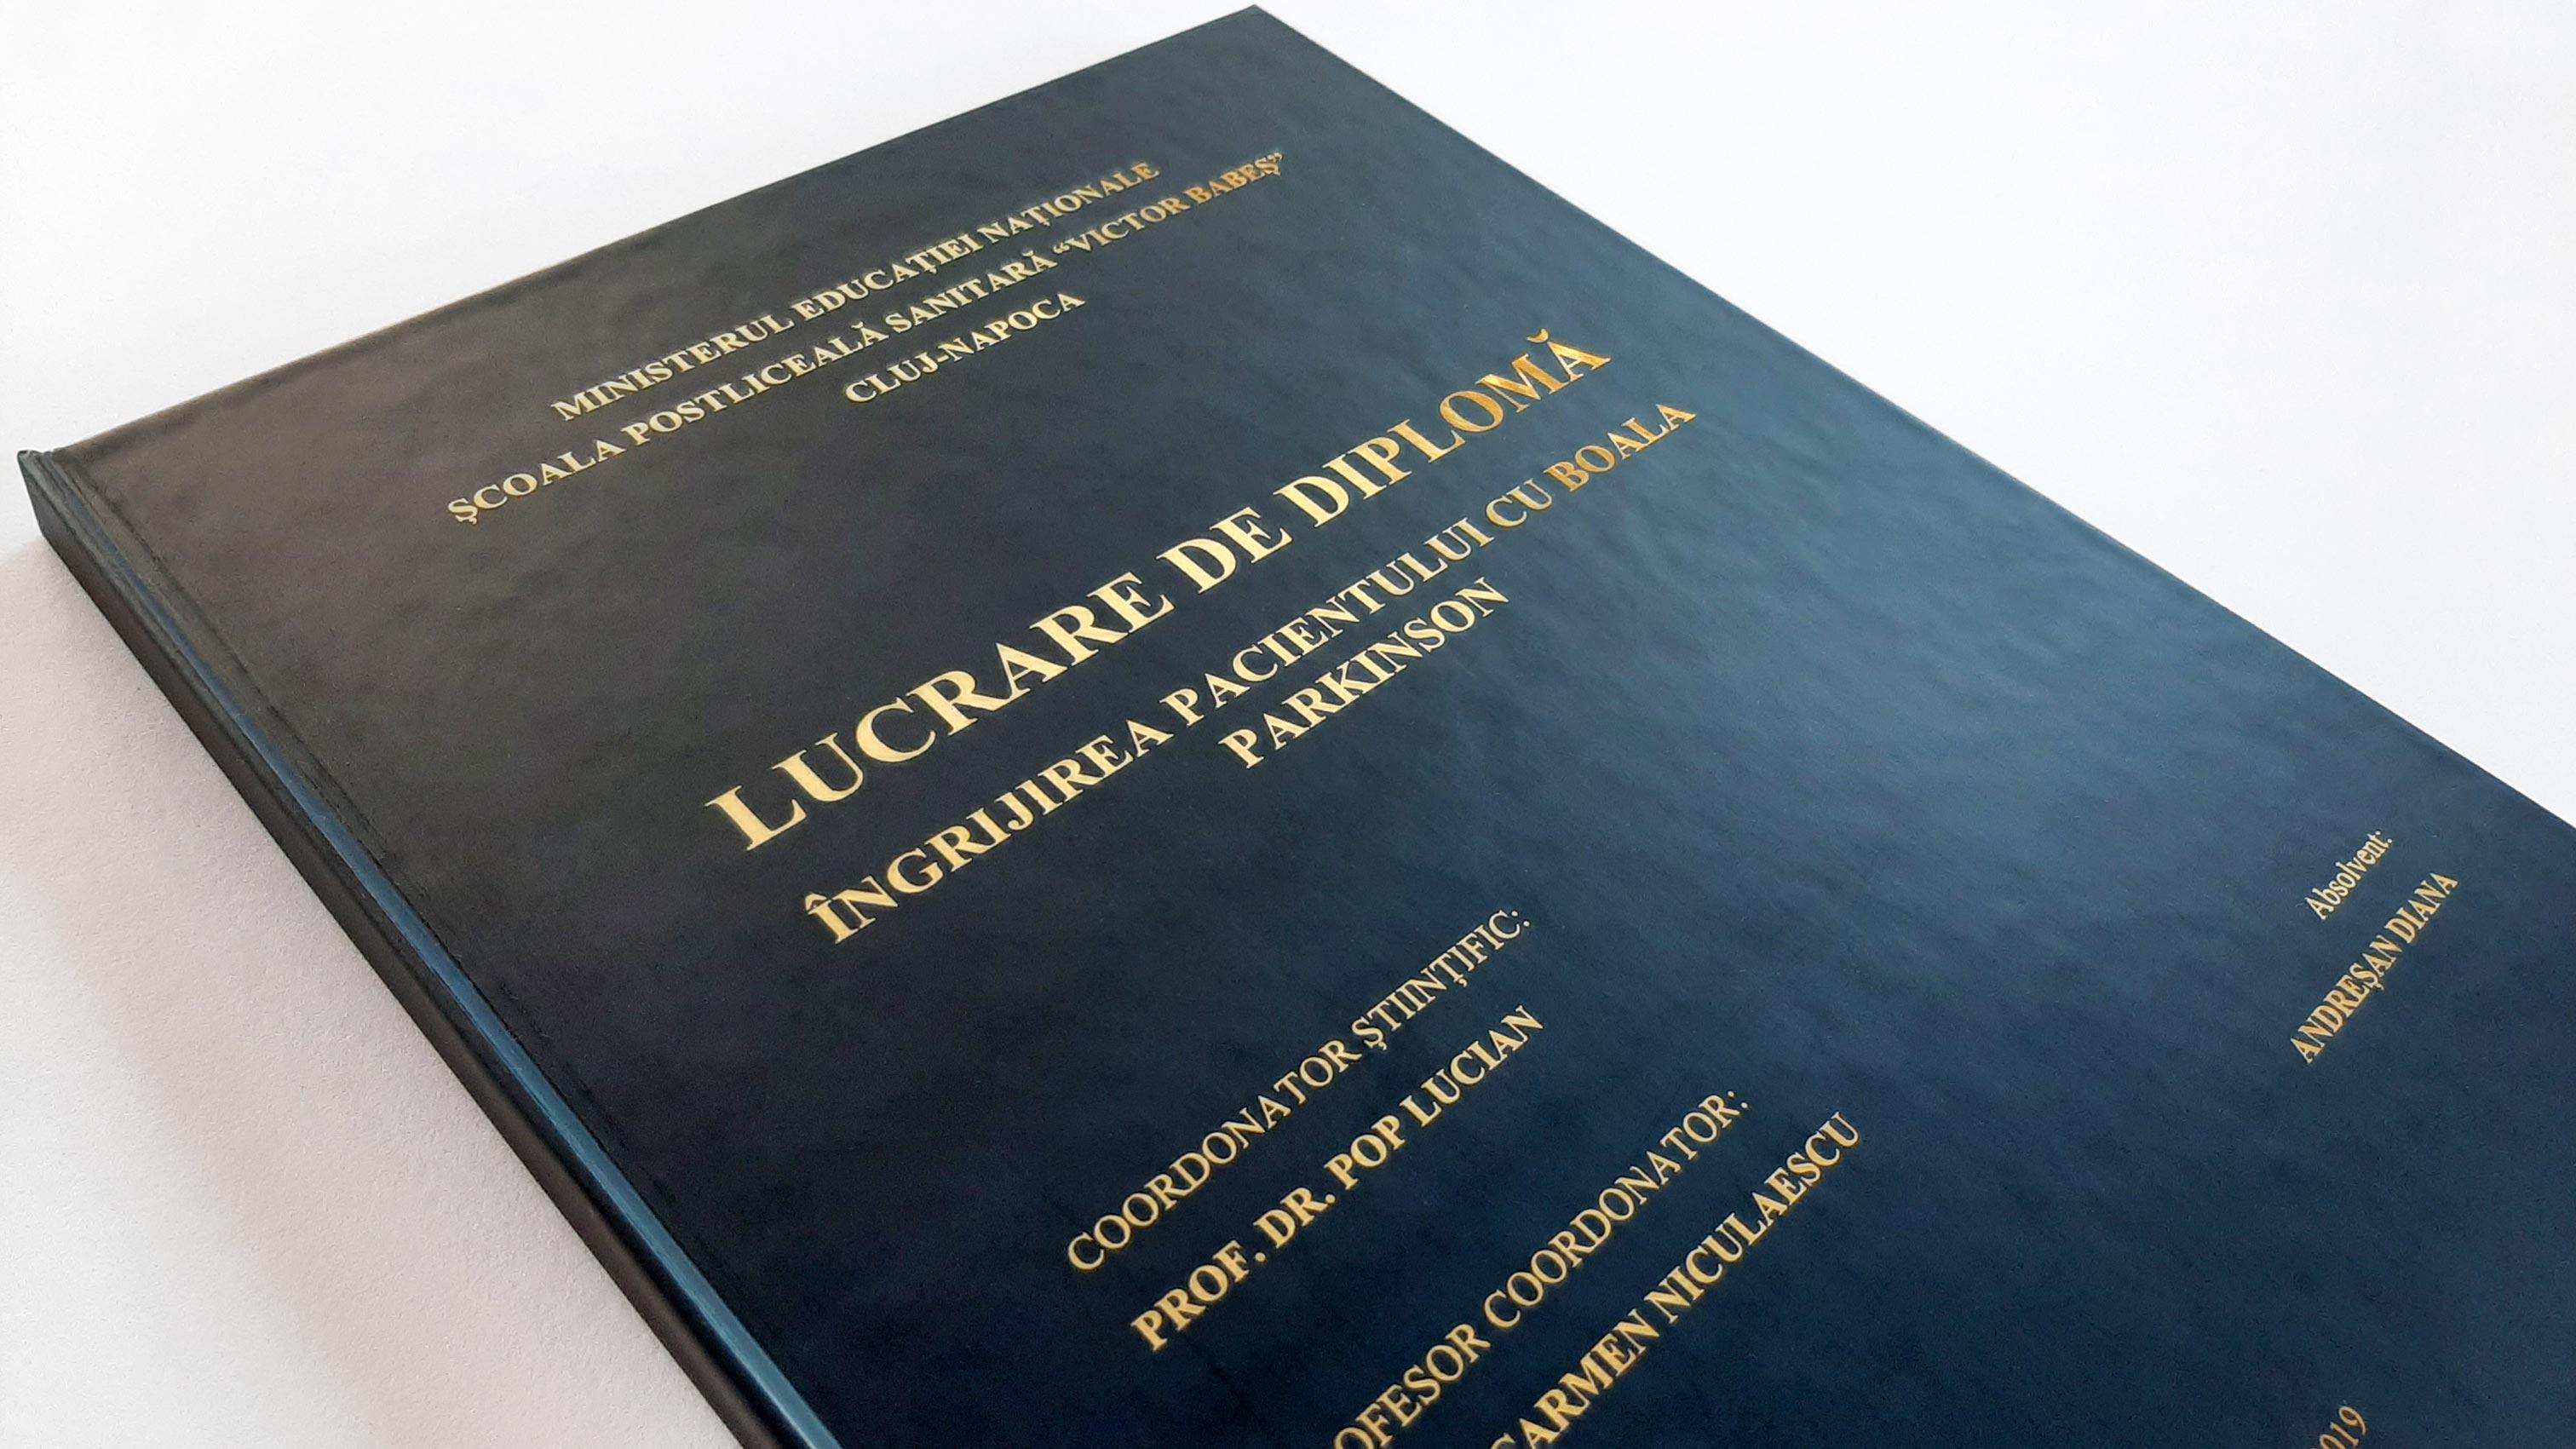 lucrare diploma folio